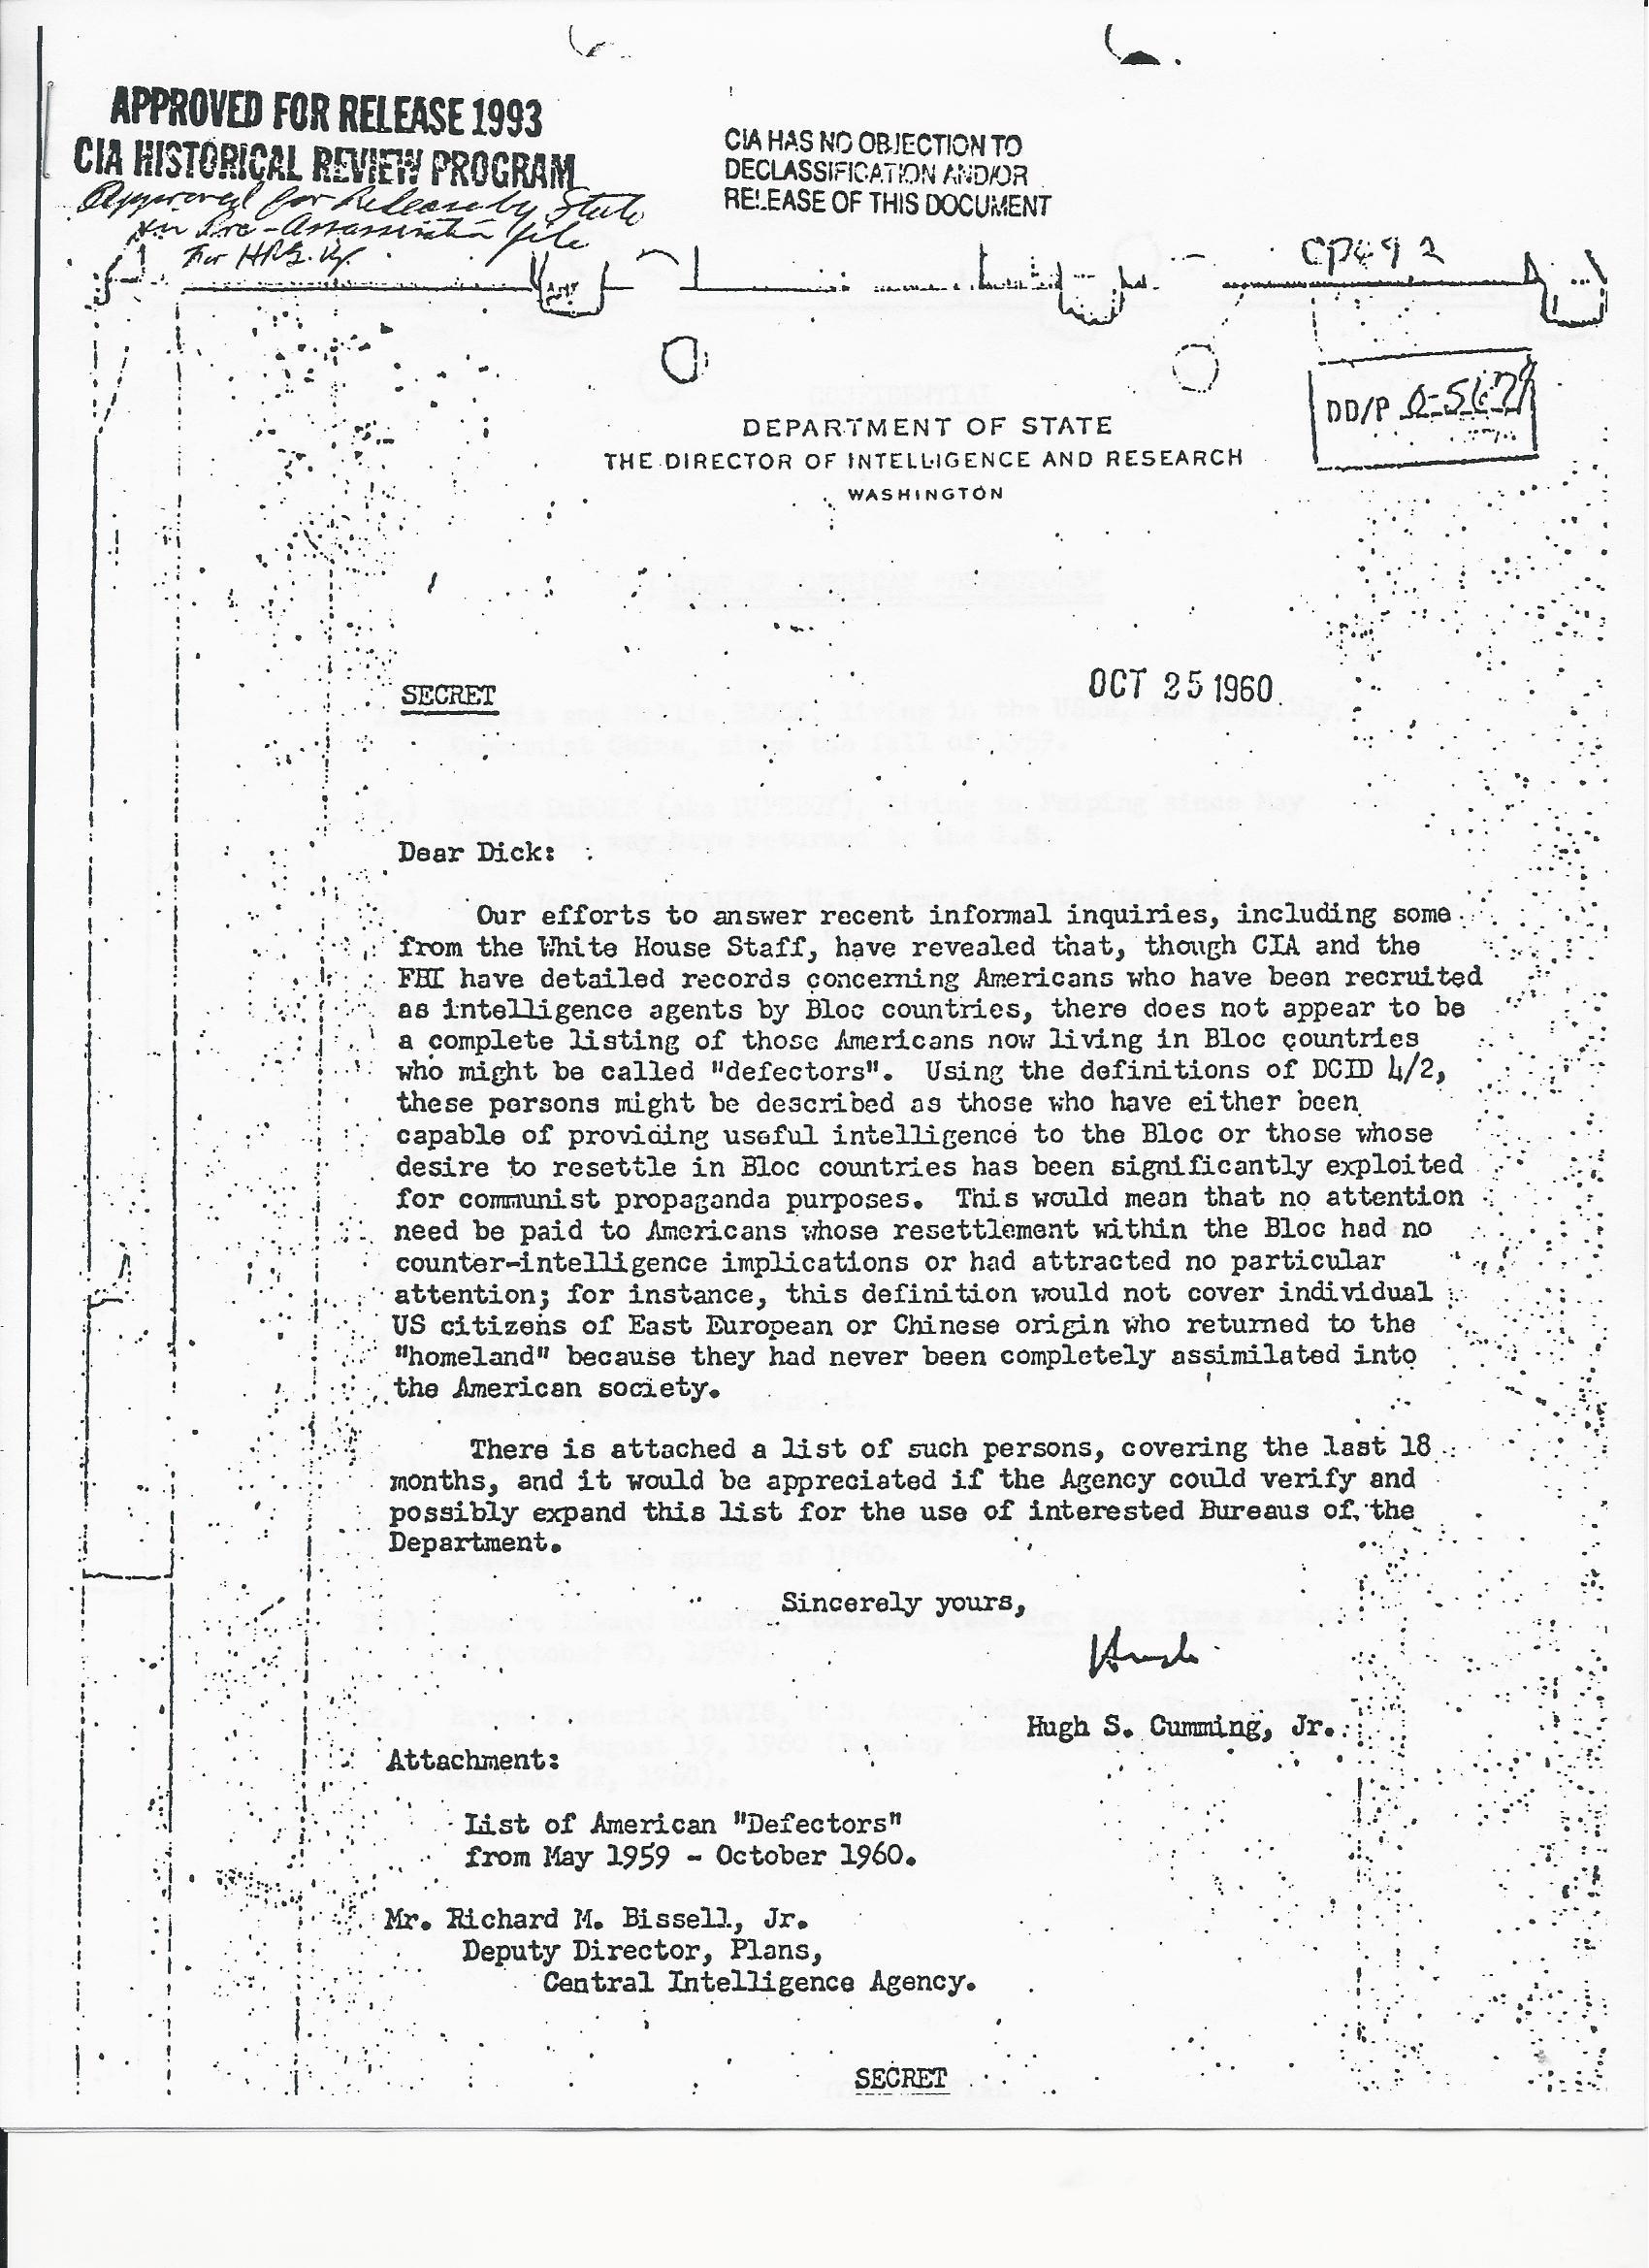 102560CUMMINGTOBISSELLREAMERICANDEFECTORS State RQST CIA List of Defectors